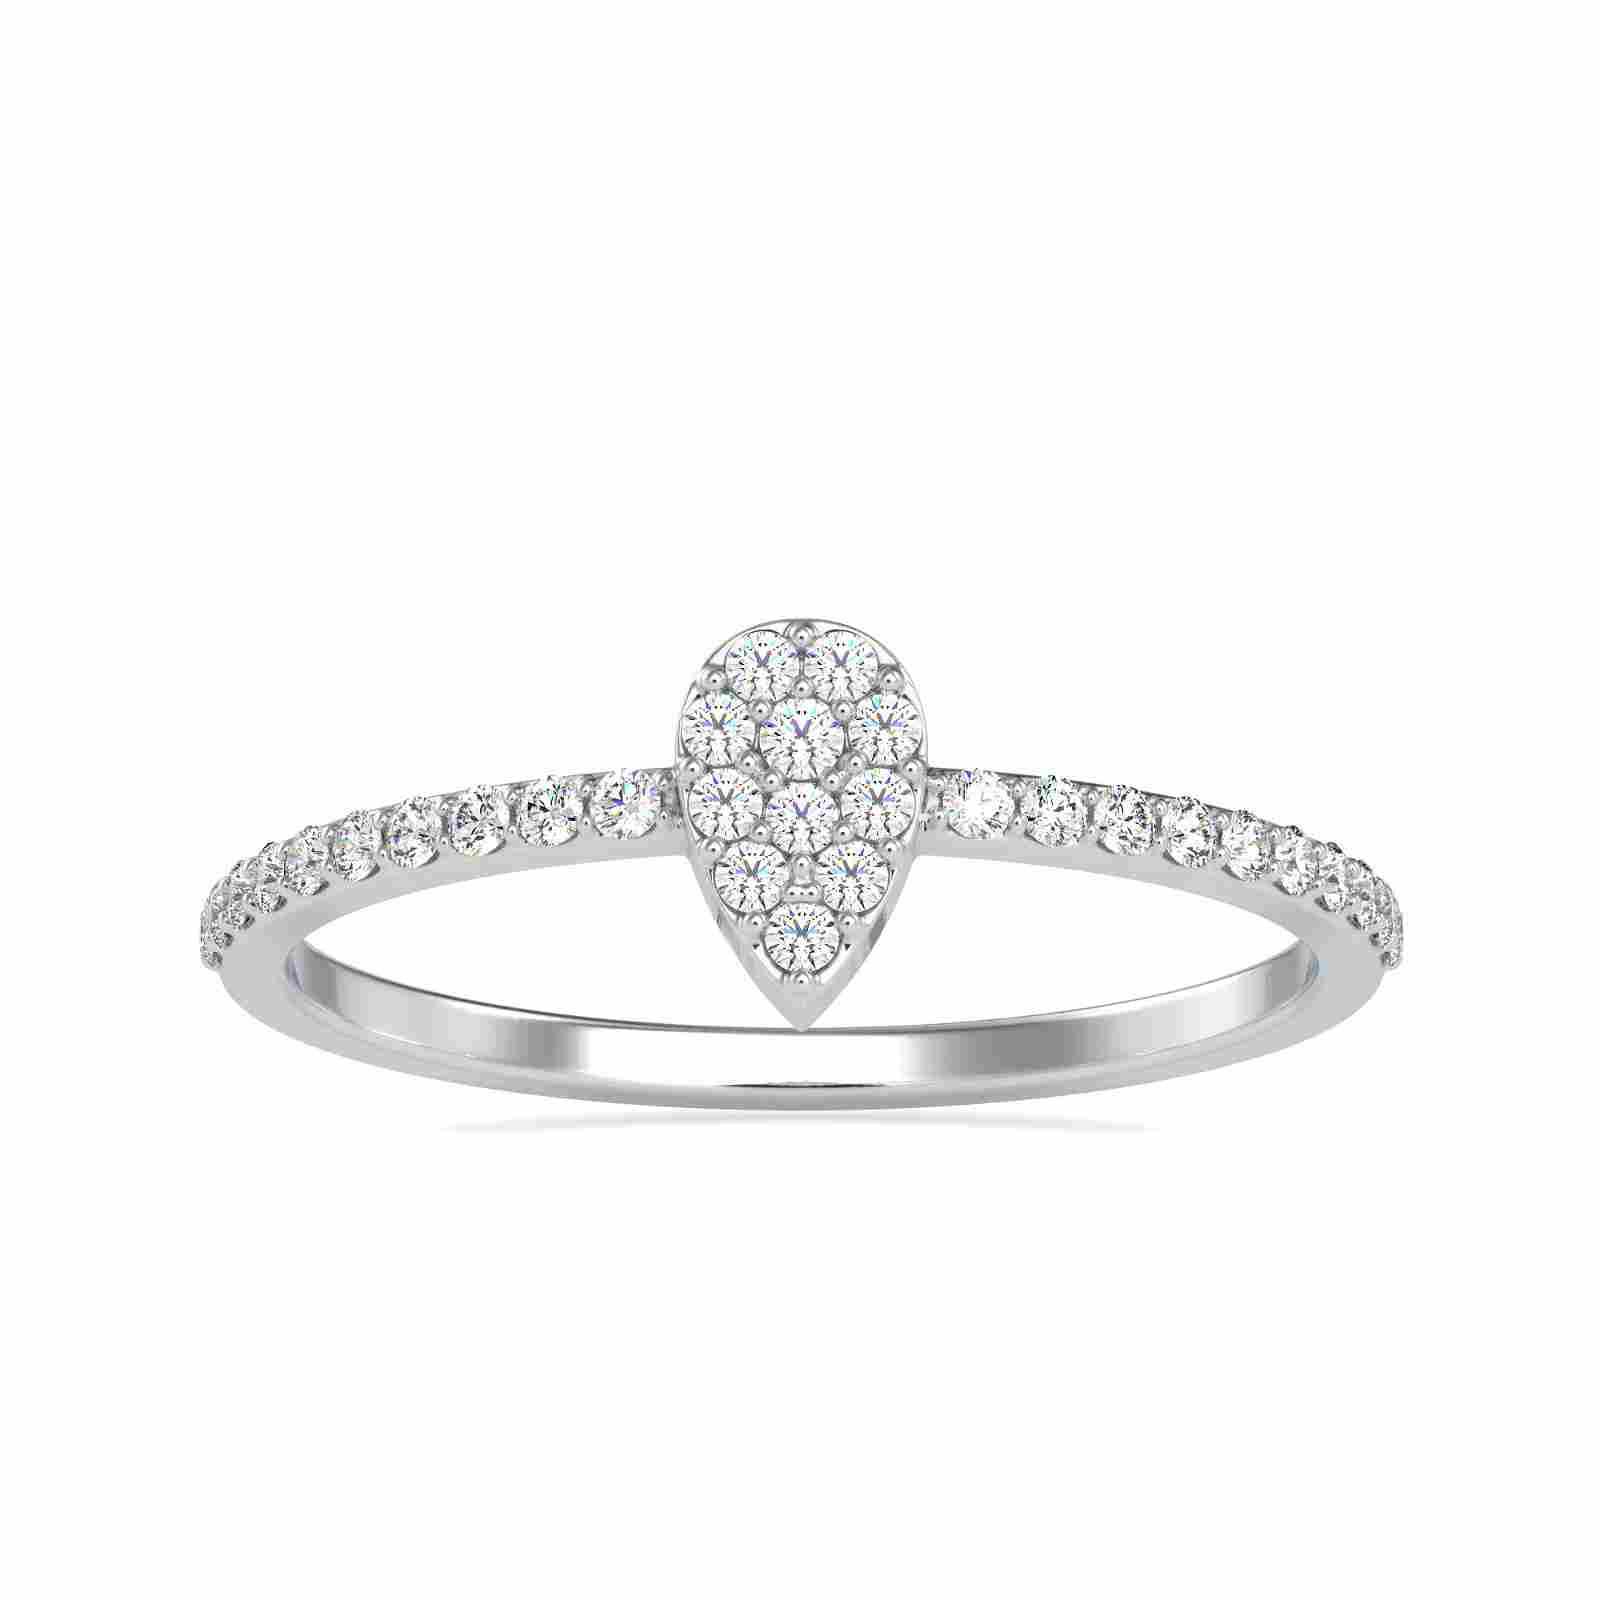 0.18CT Natural Diamond 14K White Gold Ring